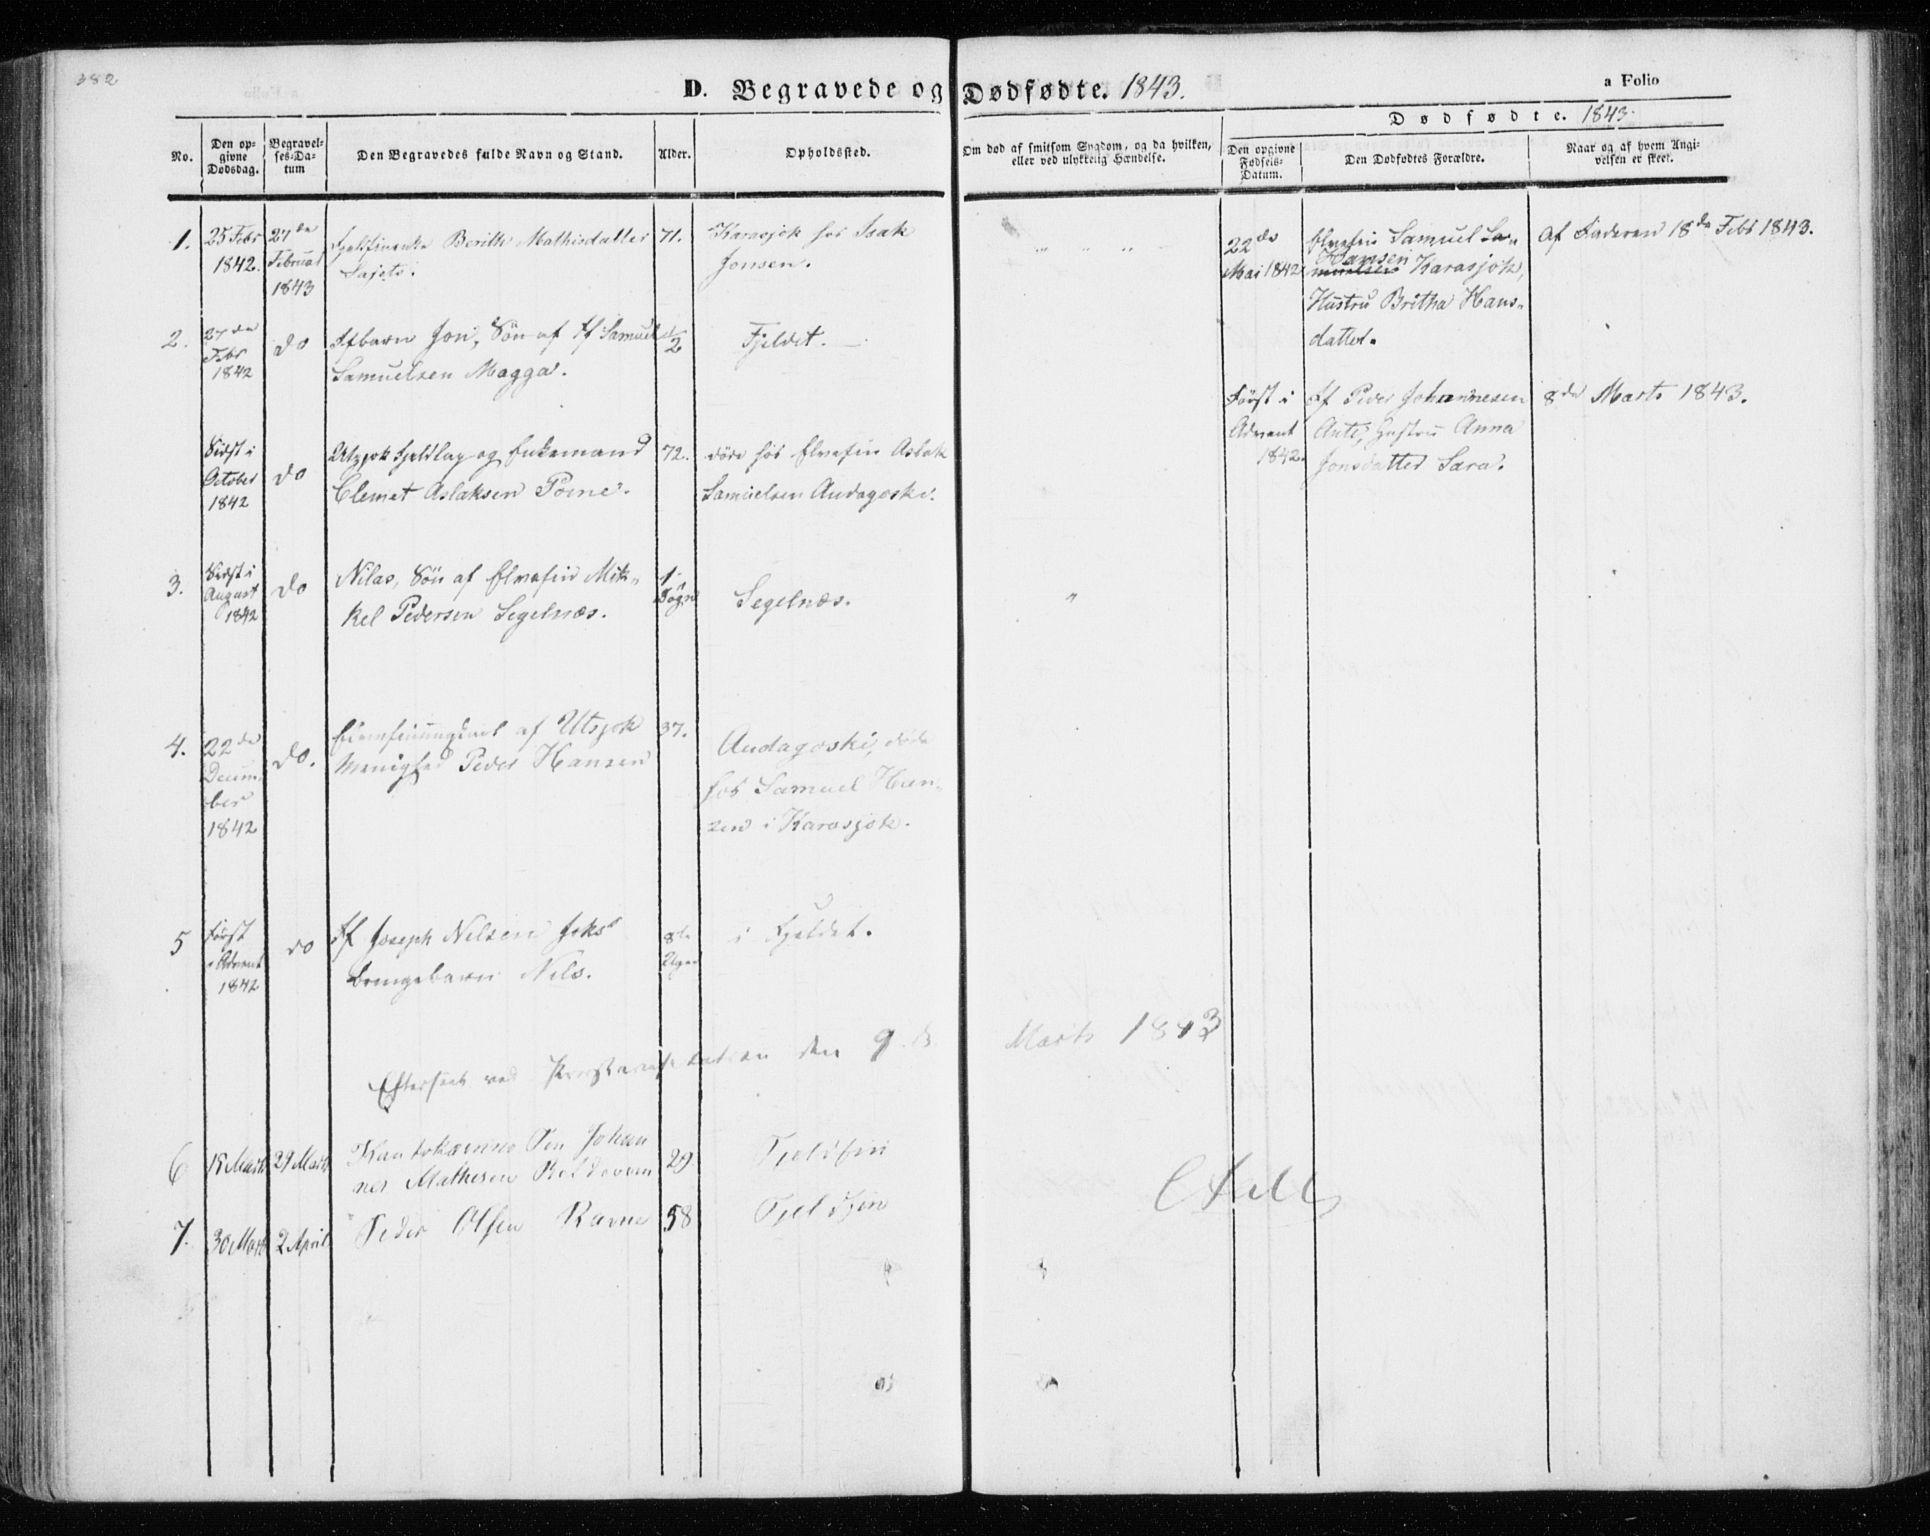 SATØ, Kistrand/Porsanger sokneprestembete, Ministerialbok nr. 12, 1843-1871, s. 382-383